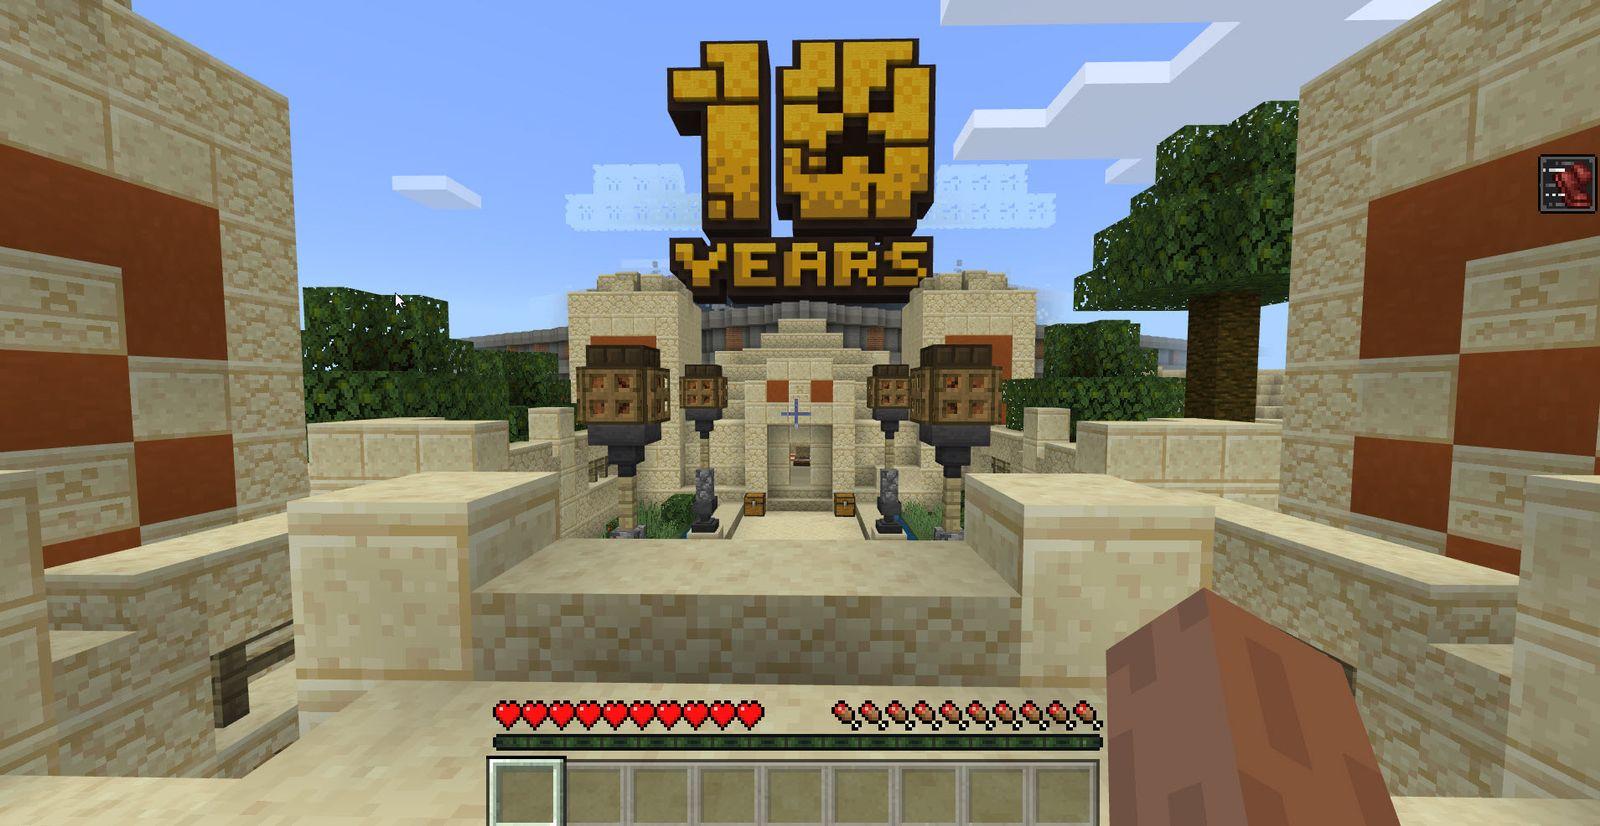 NUR ALS ZITAT Screenshot Minecraft Mojang Stockholm